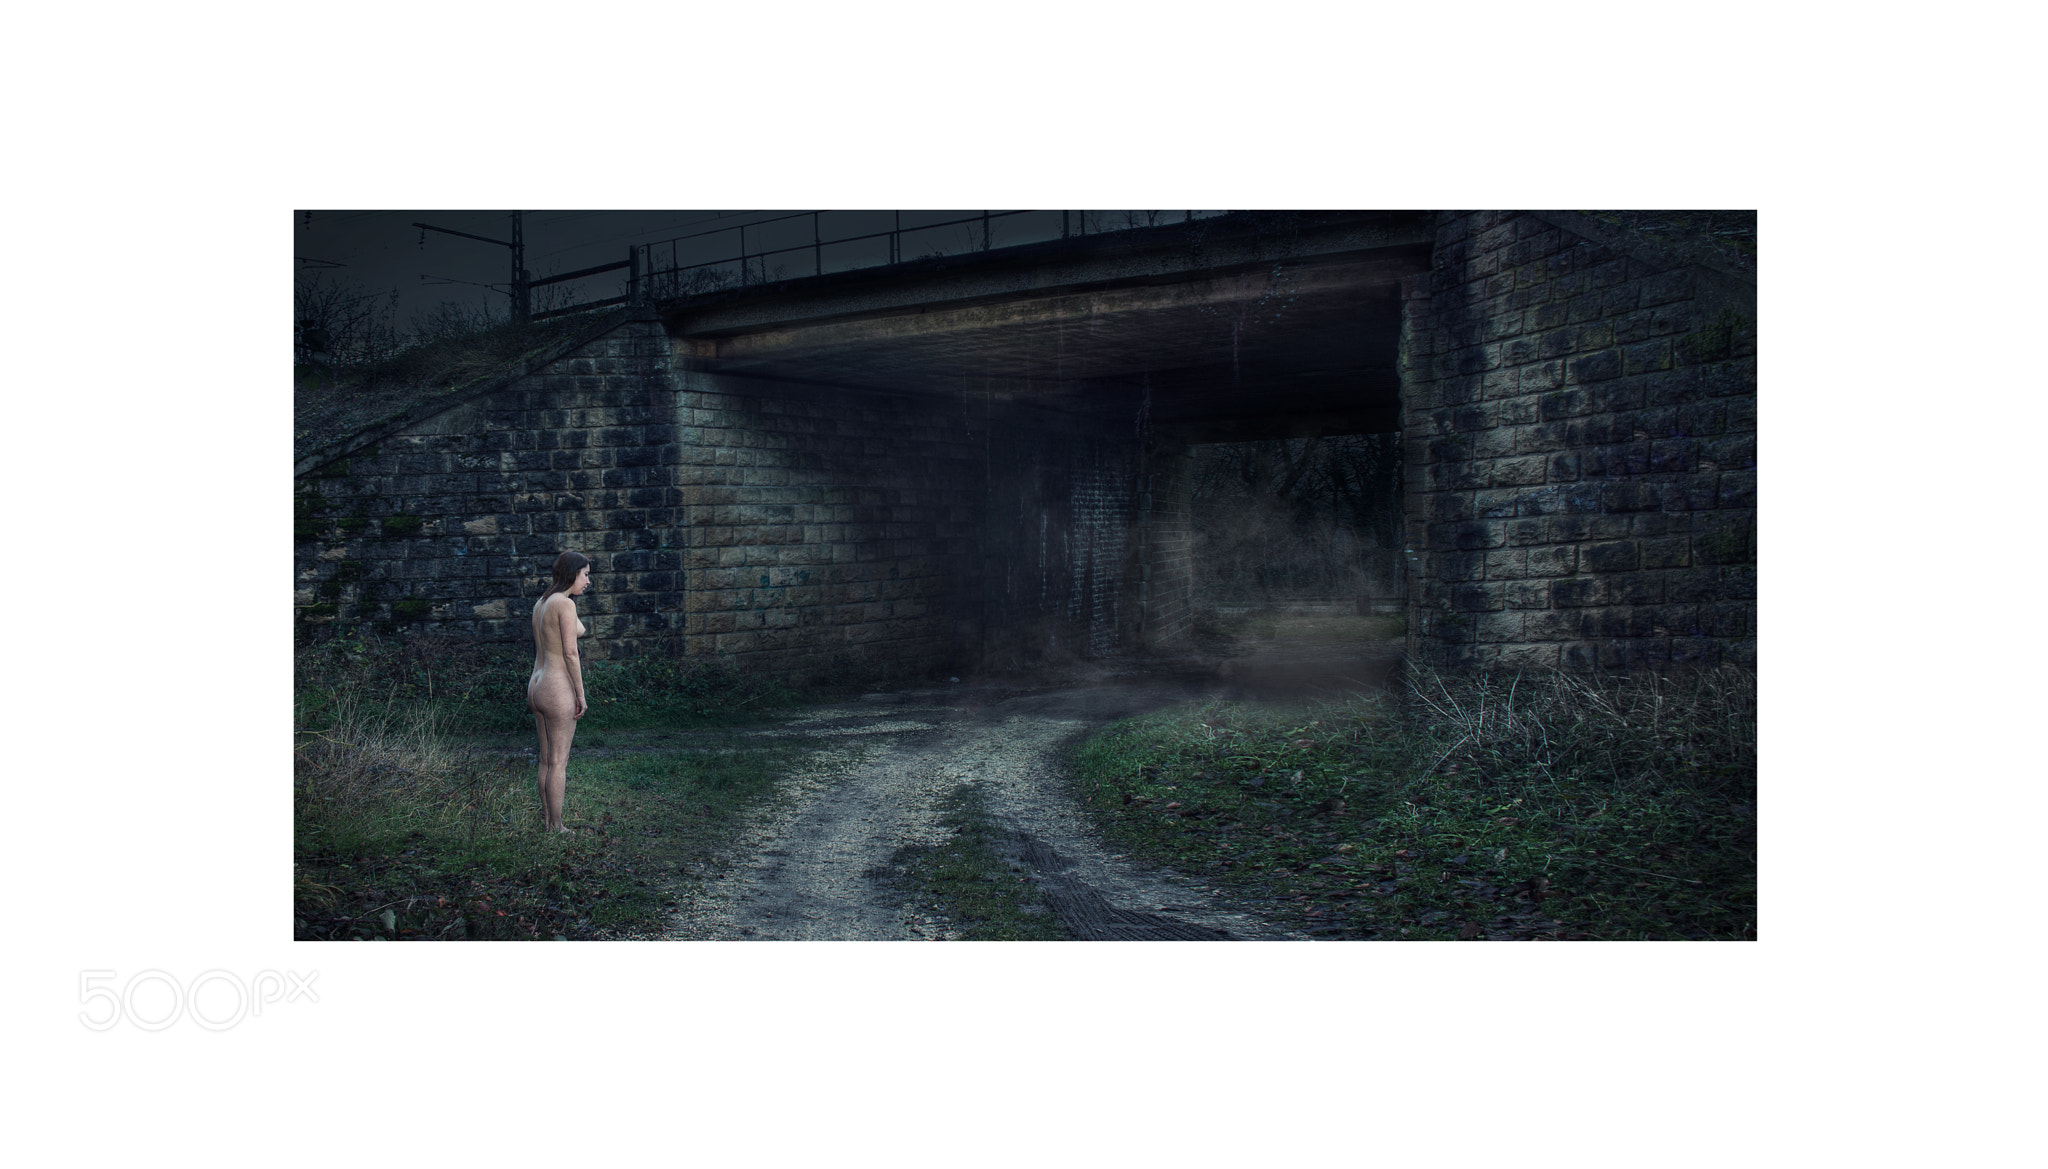 Photograph Lost in bridge by Julien Dumas on 500px